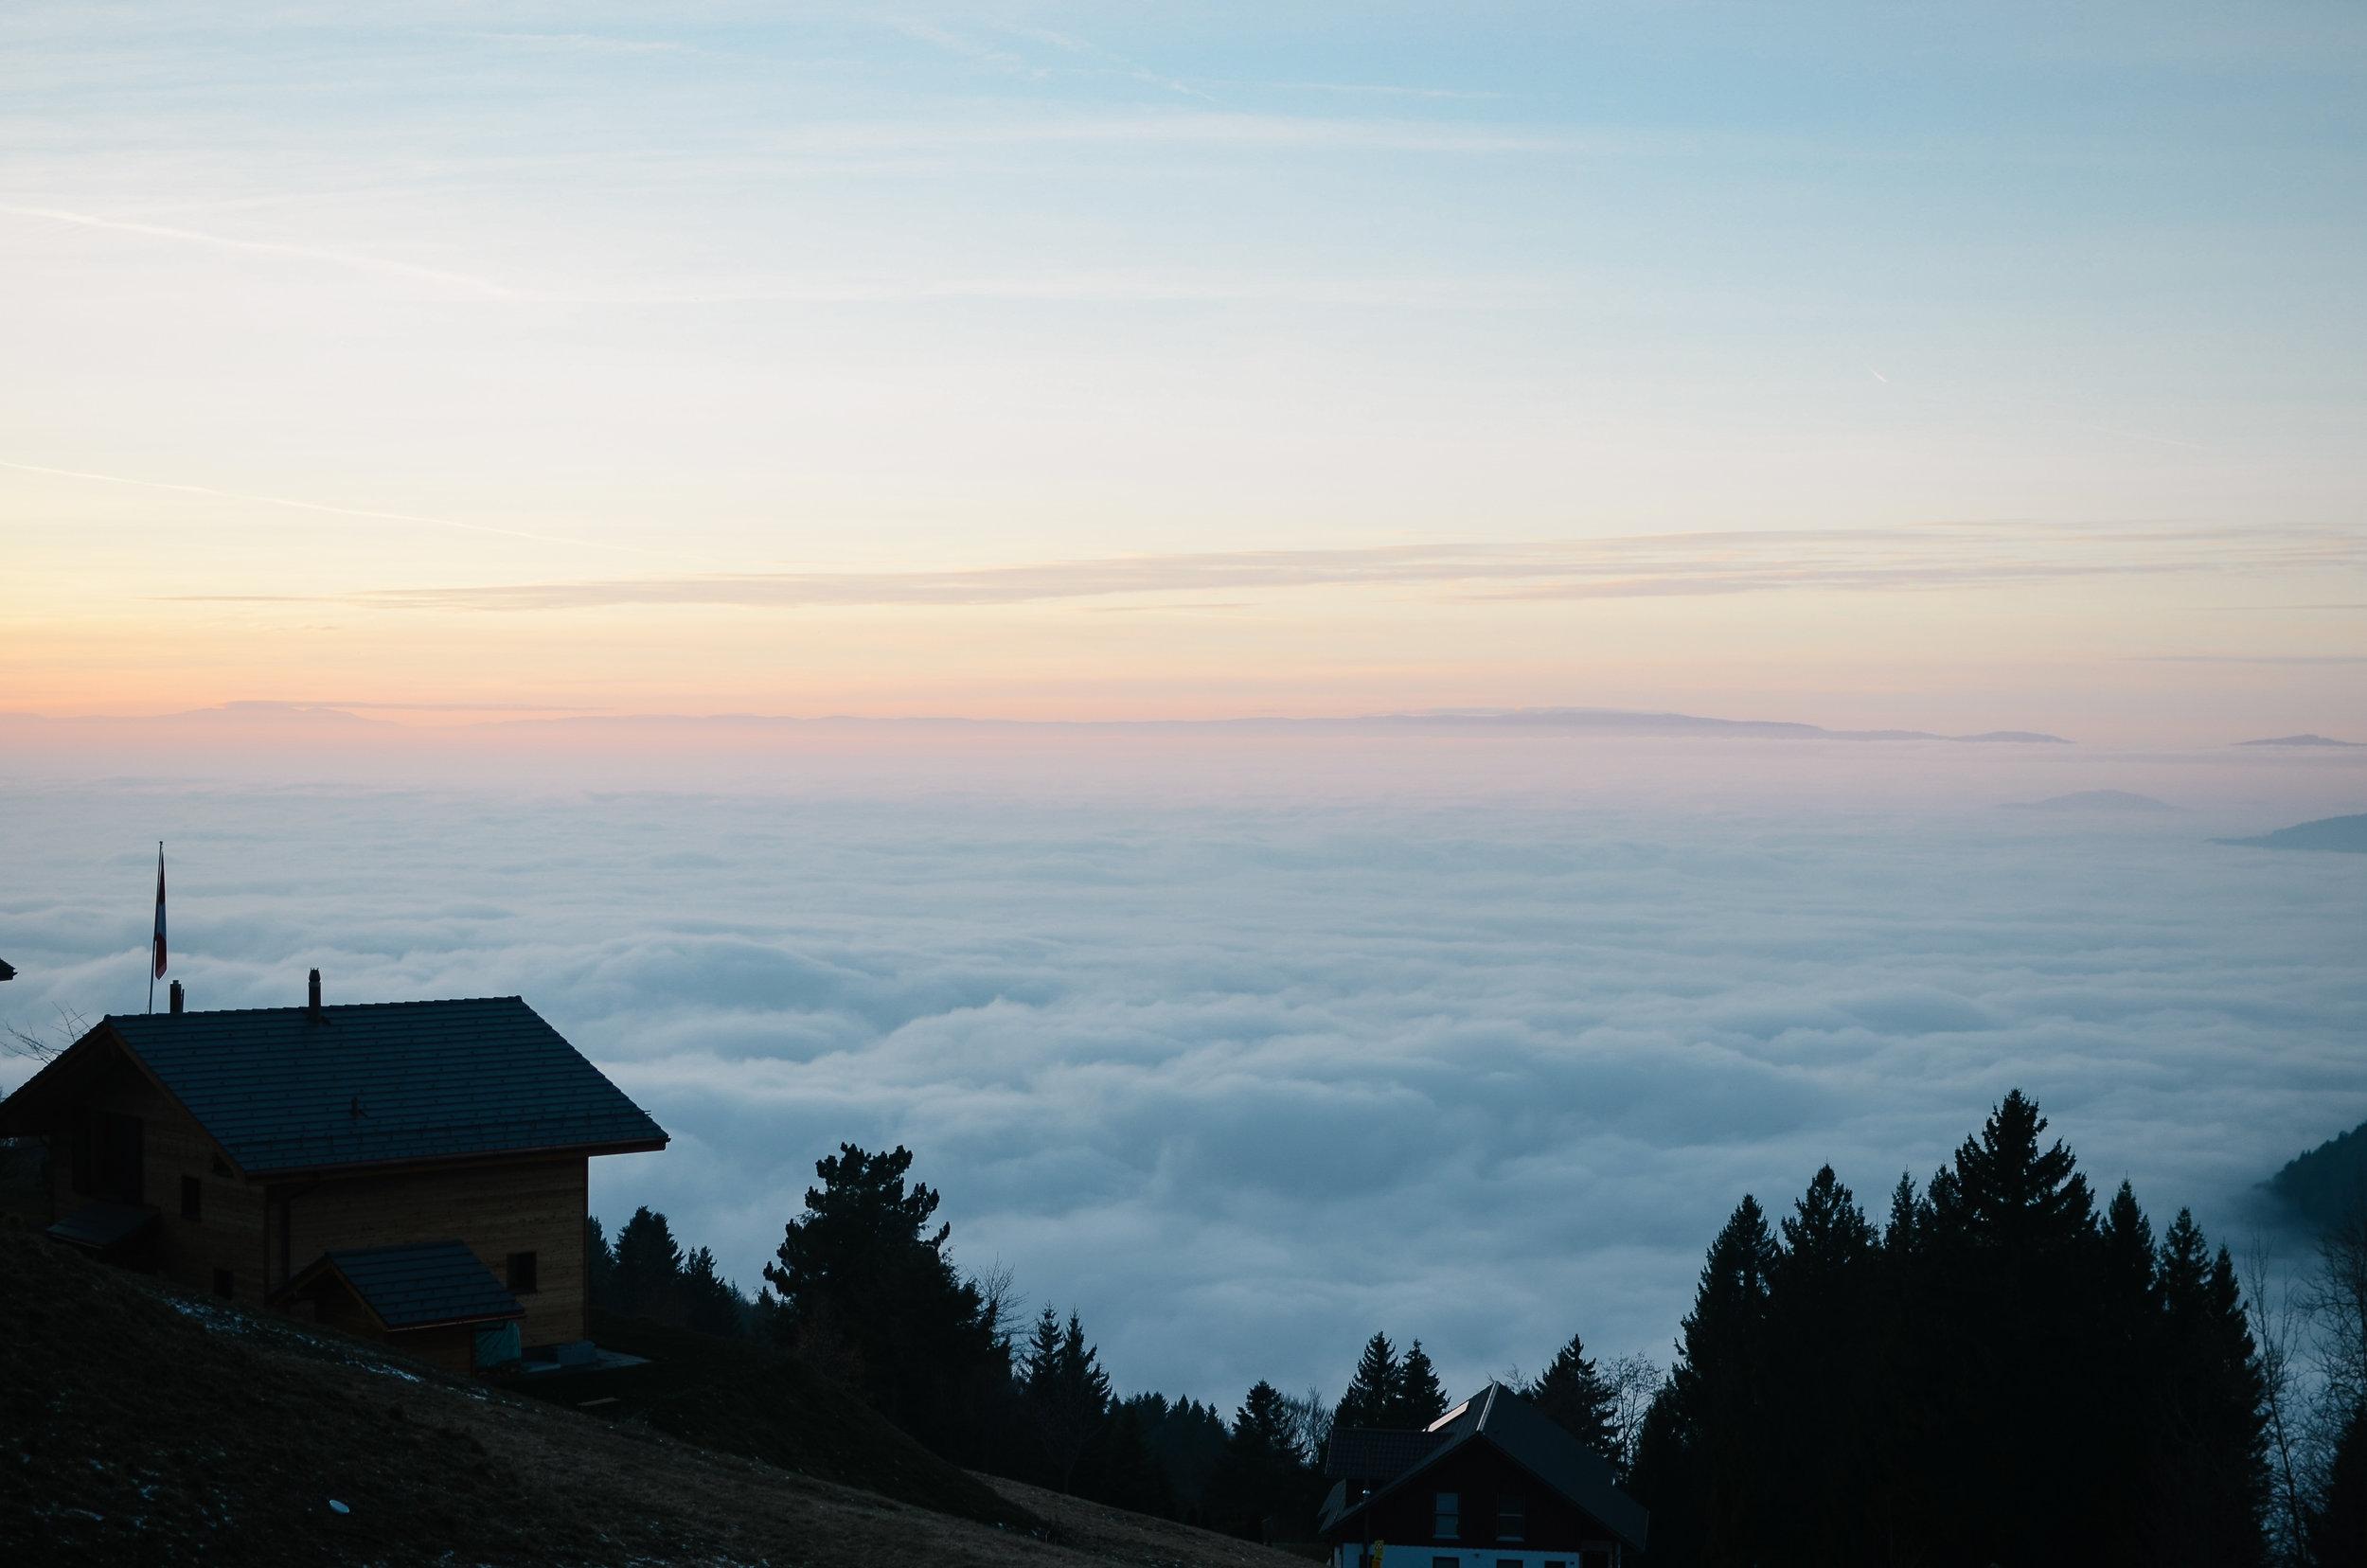 Switzerland-Day-Trips-From-Geneva-LifeOnPine_DSC_0692.jpg